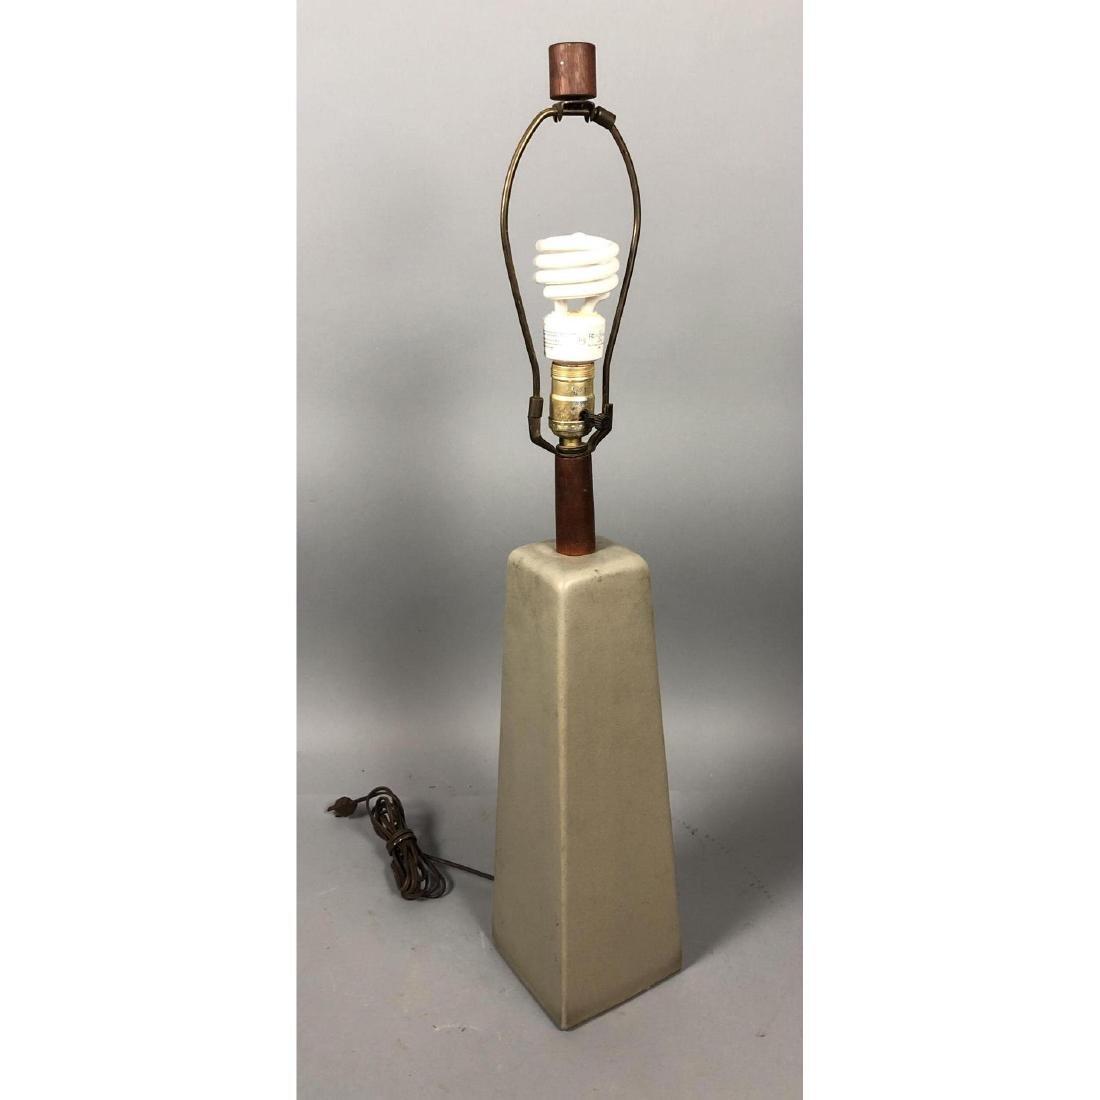 MARTZ for MARSHALL STUDIOS 4 Sided Ceramic Lamp.